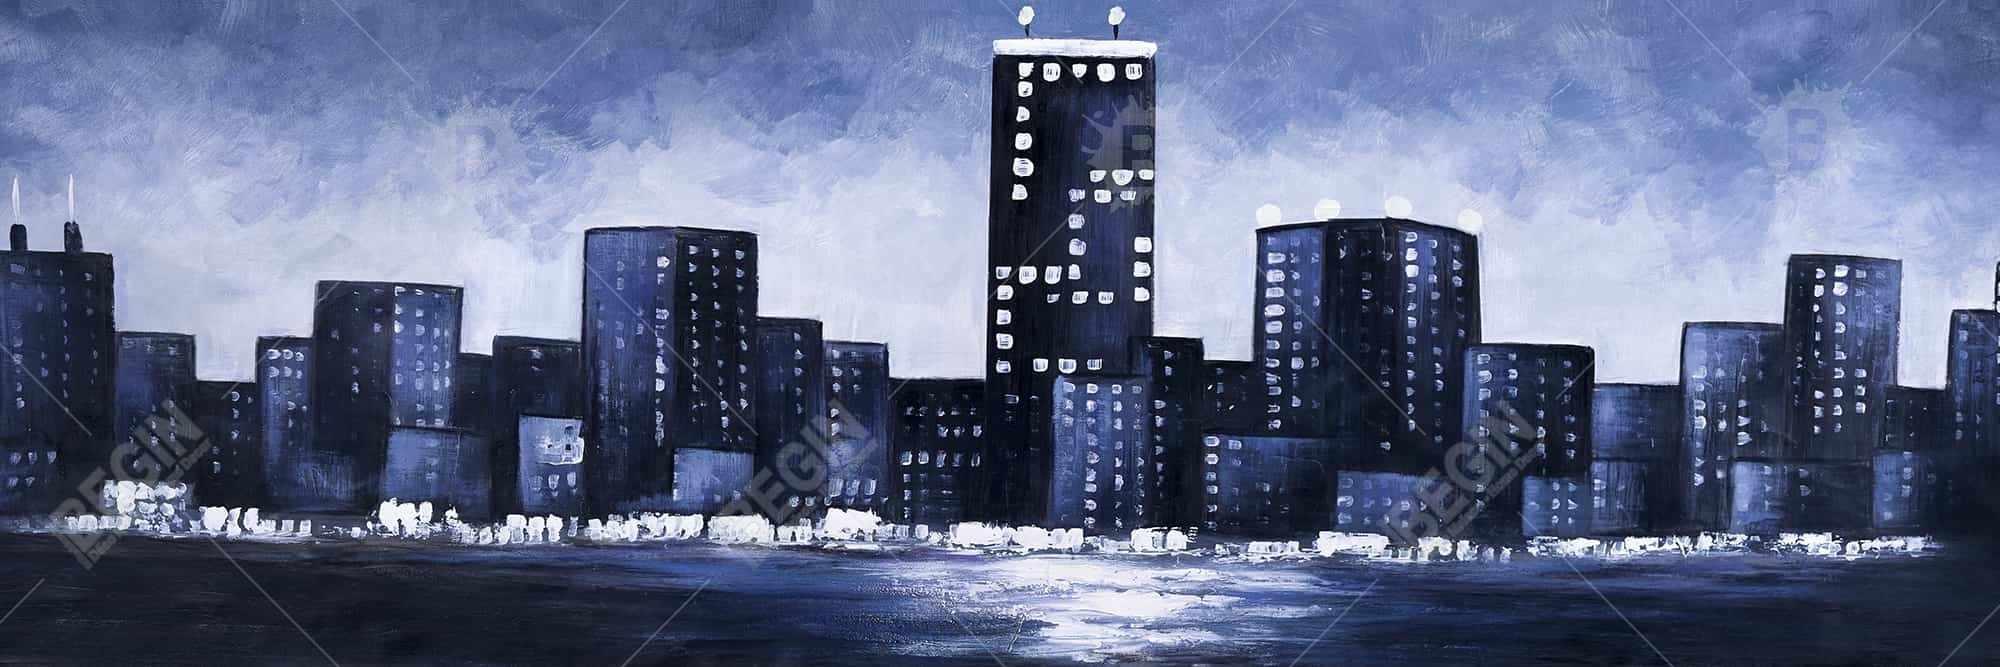 Towering over buildings